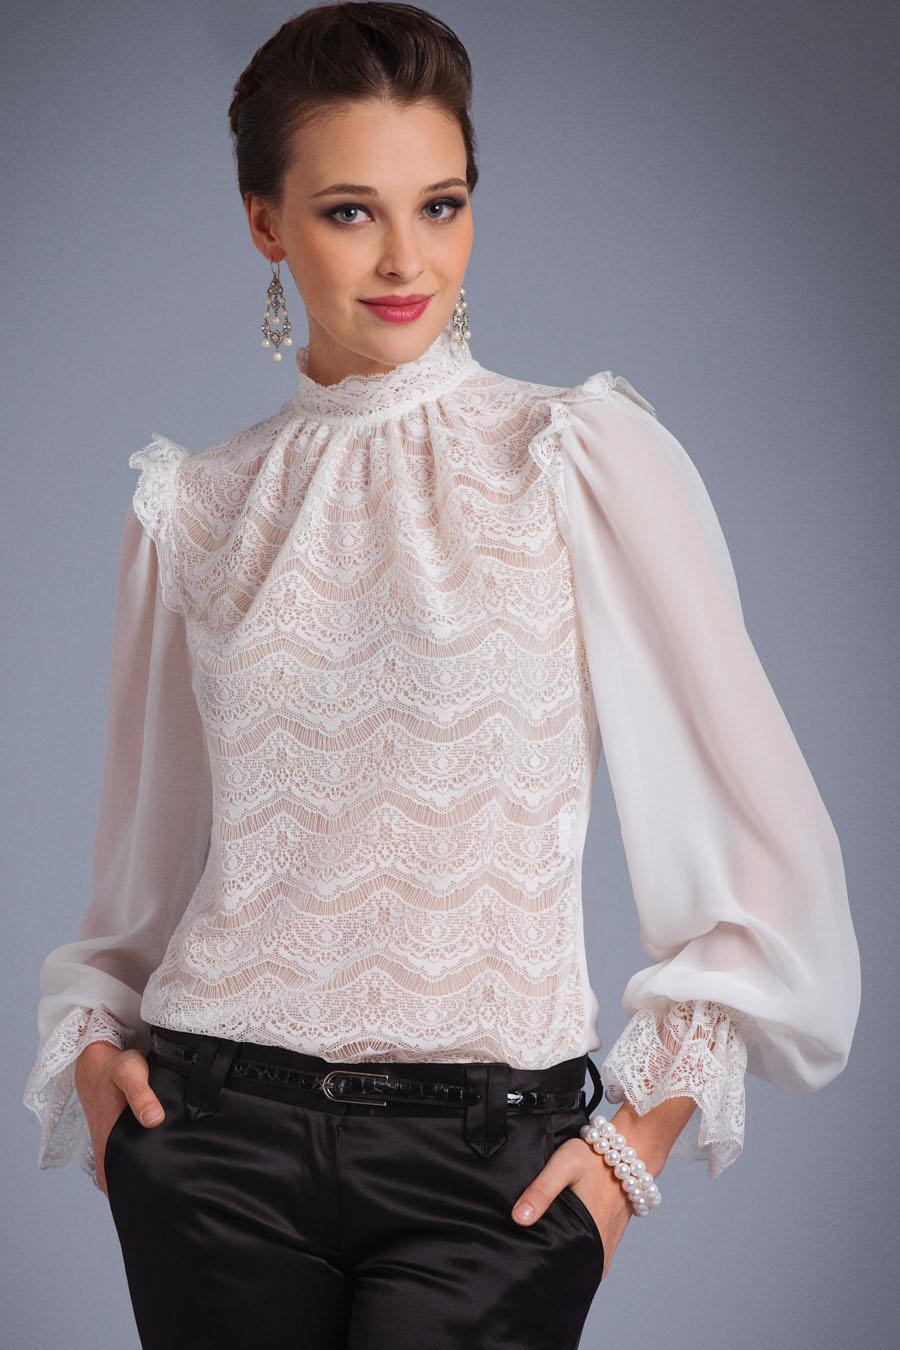 Блузка На Свадьбу Фото В Омске